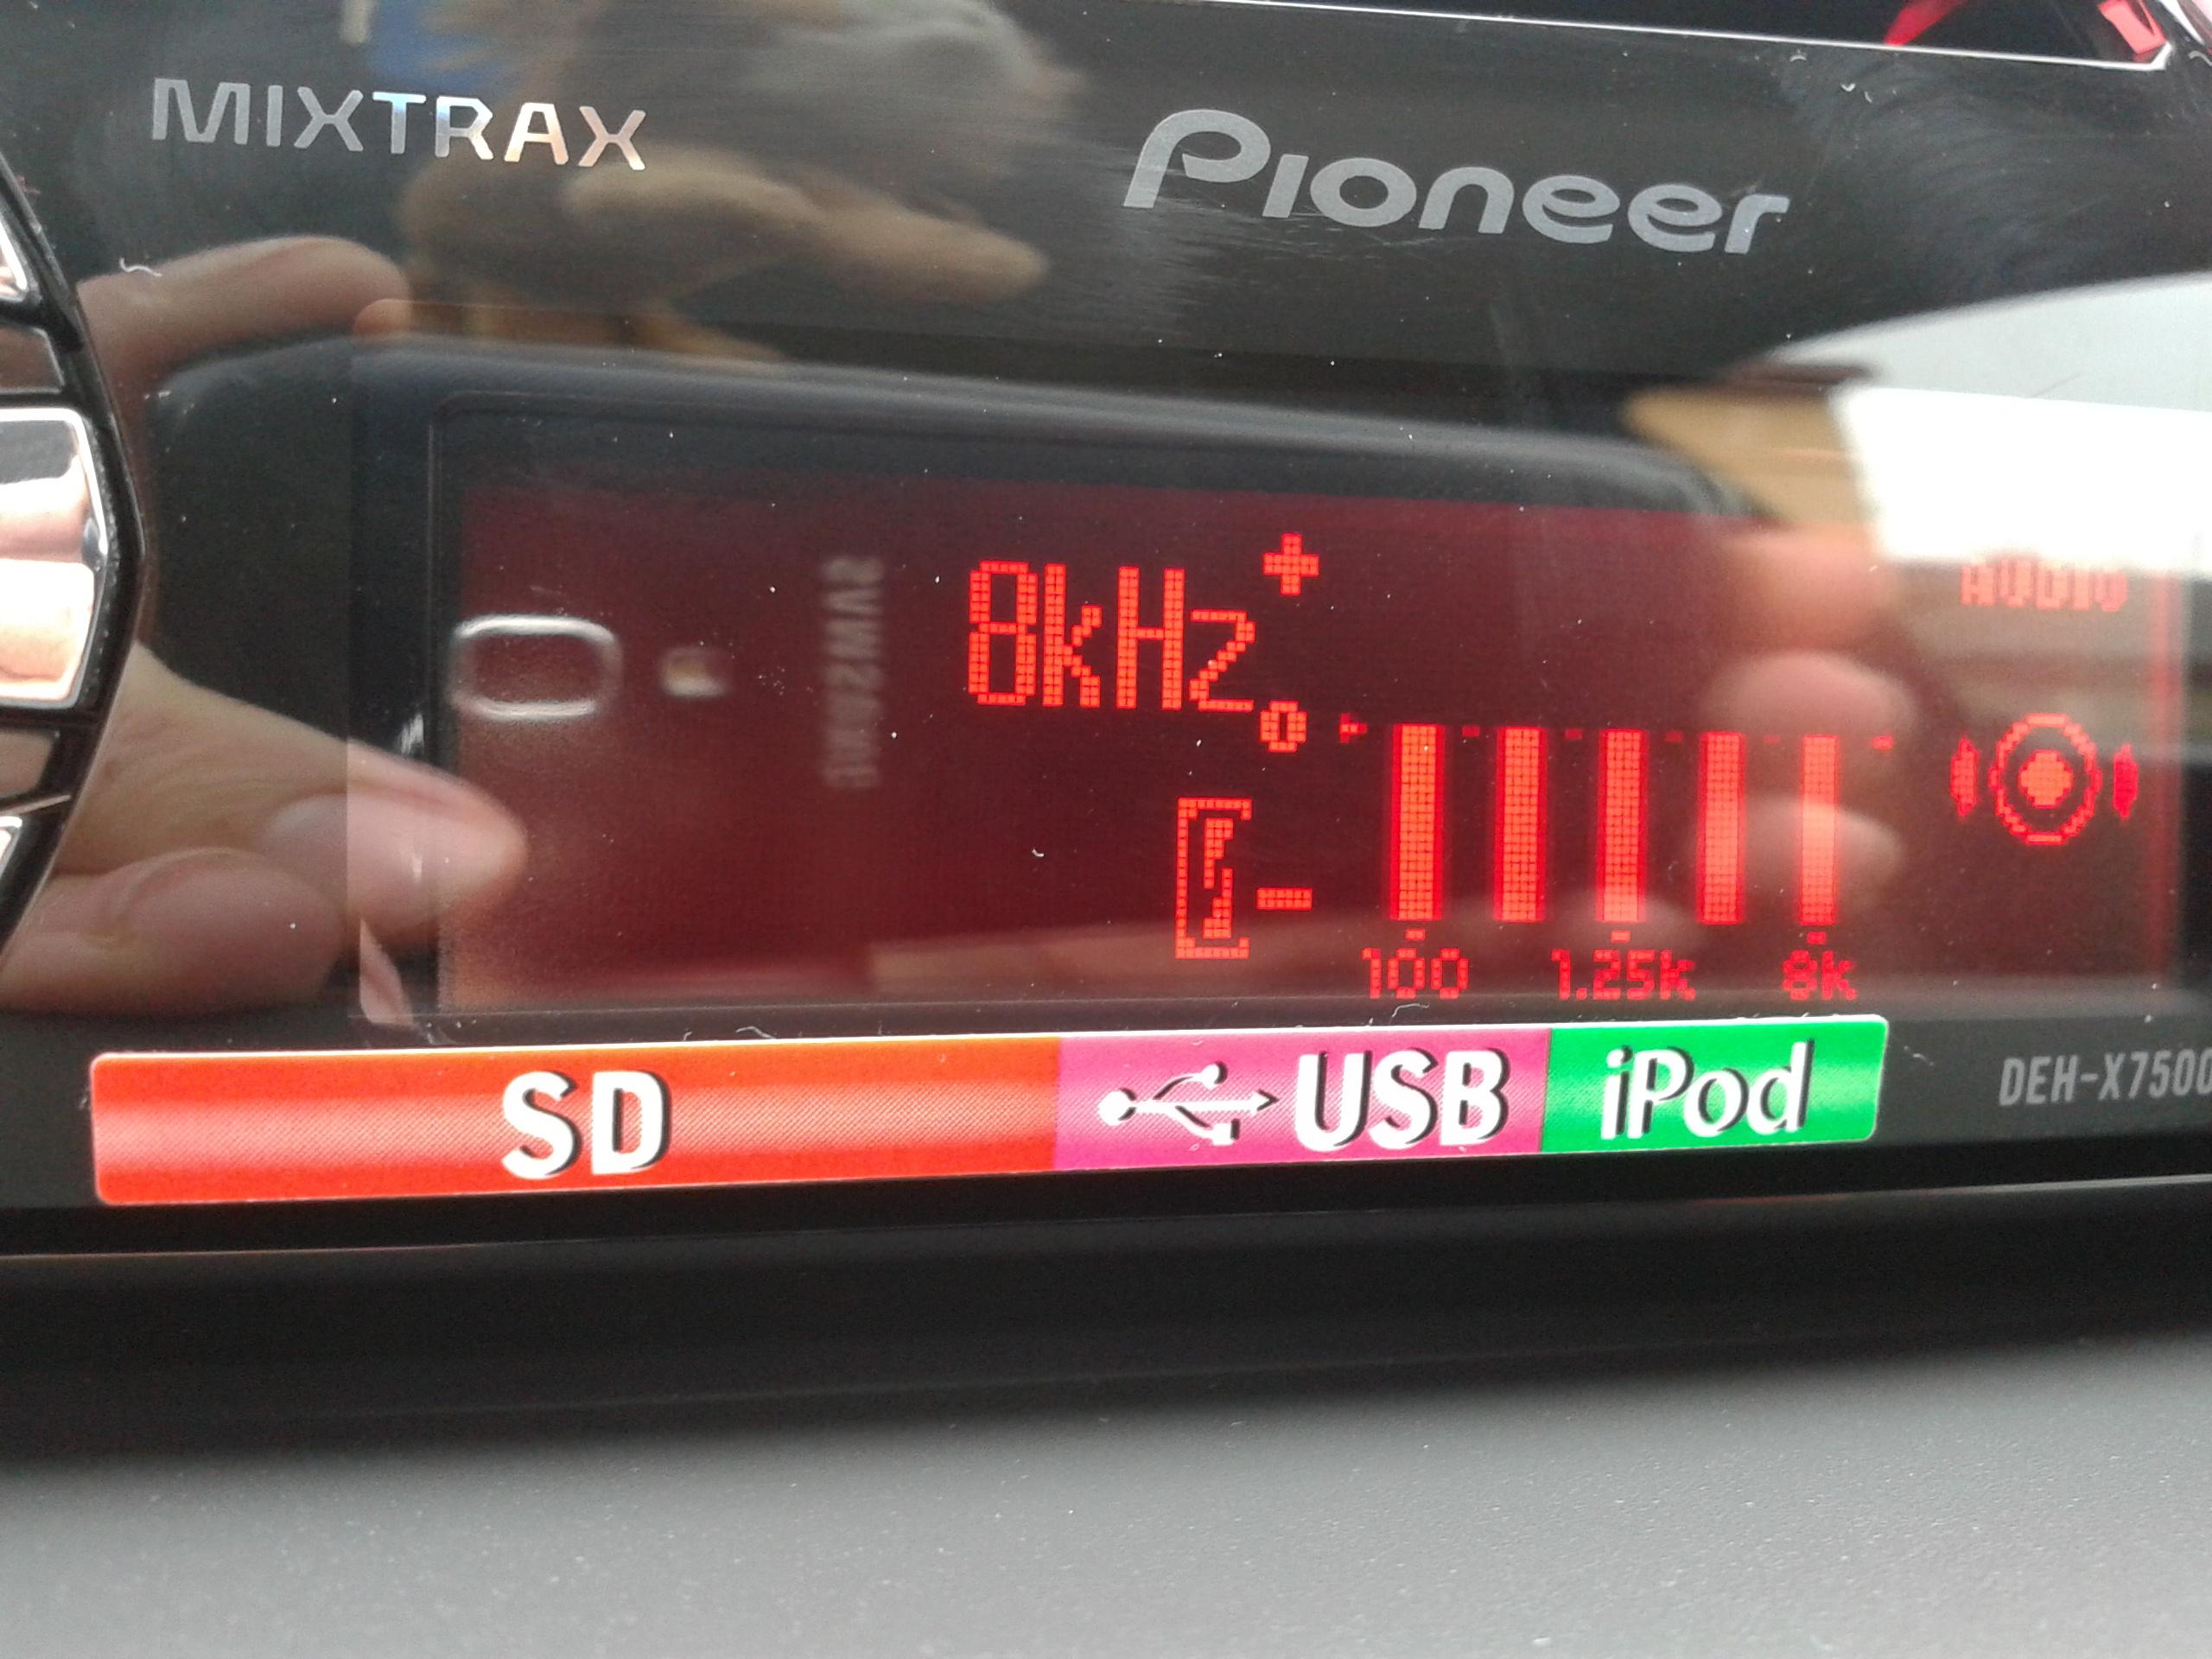 Konfiguracja radia - Filtry,Sla i inne